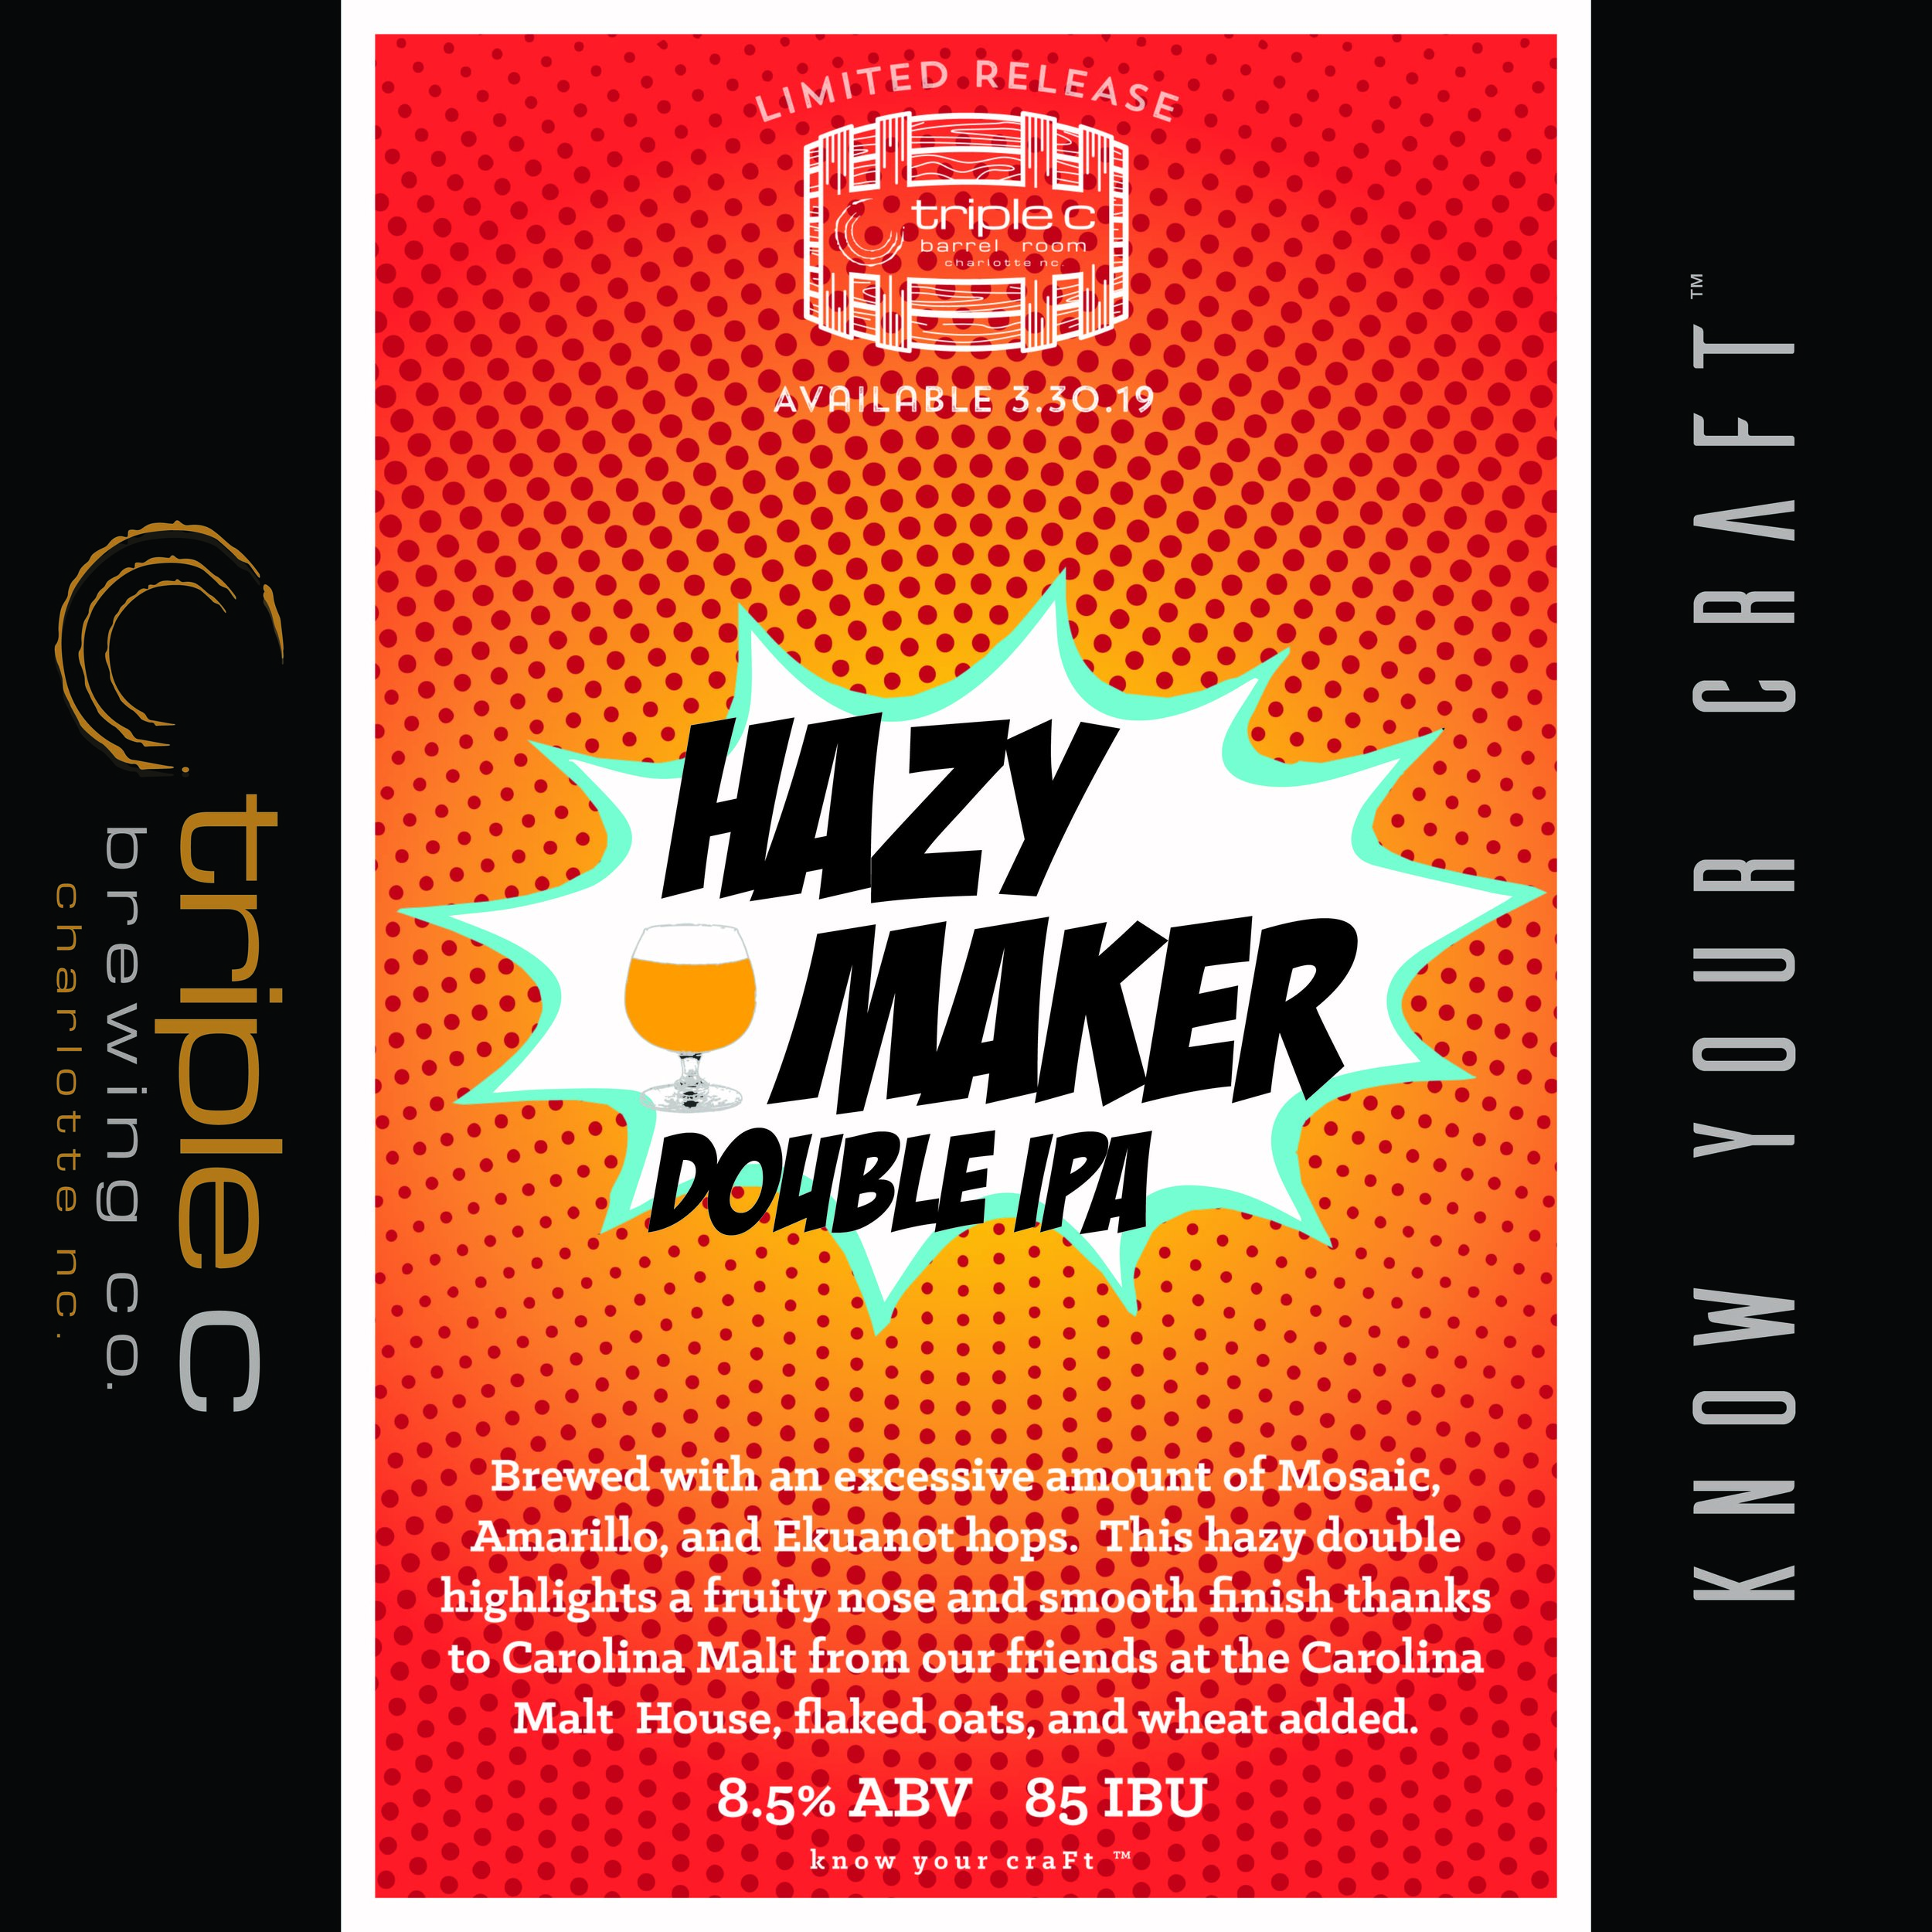 HazyMaker2_Media2.jpg